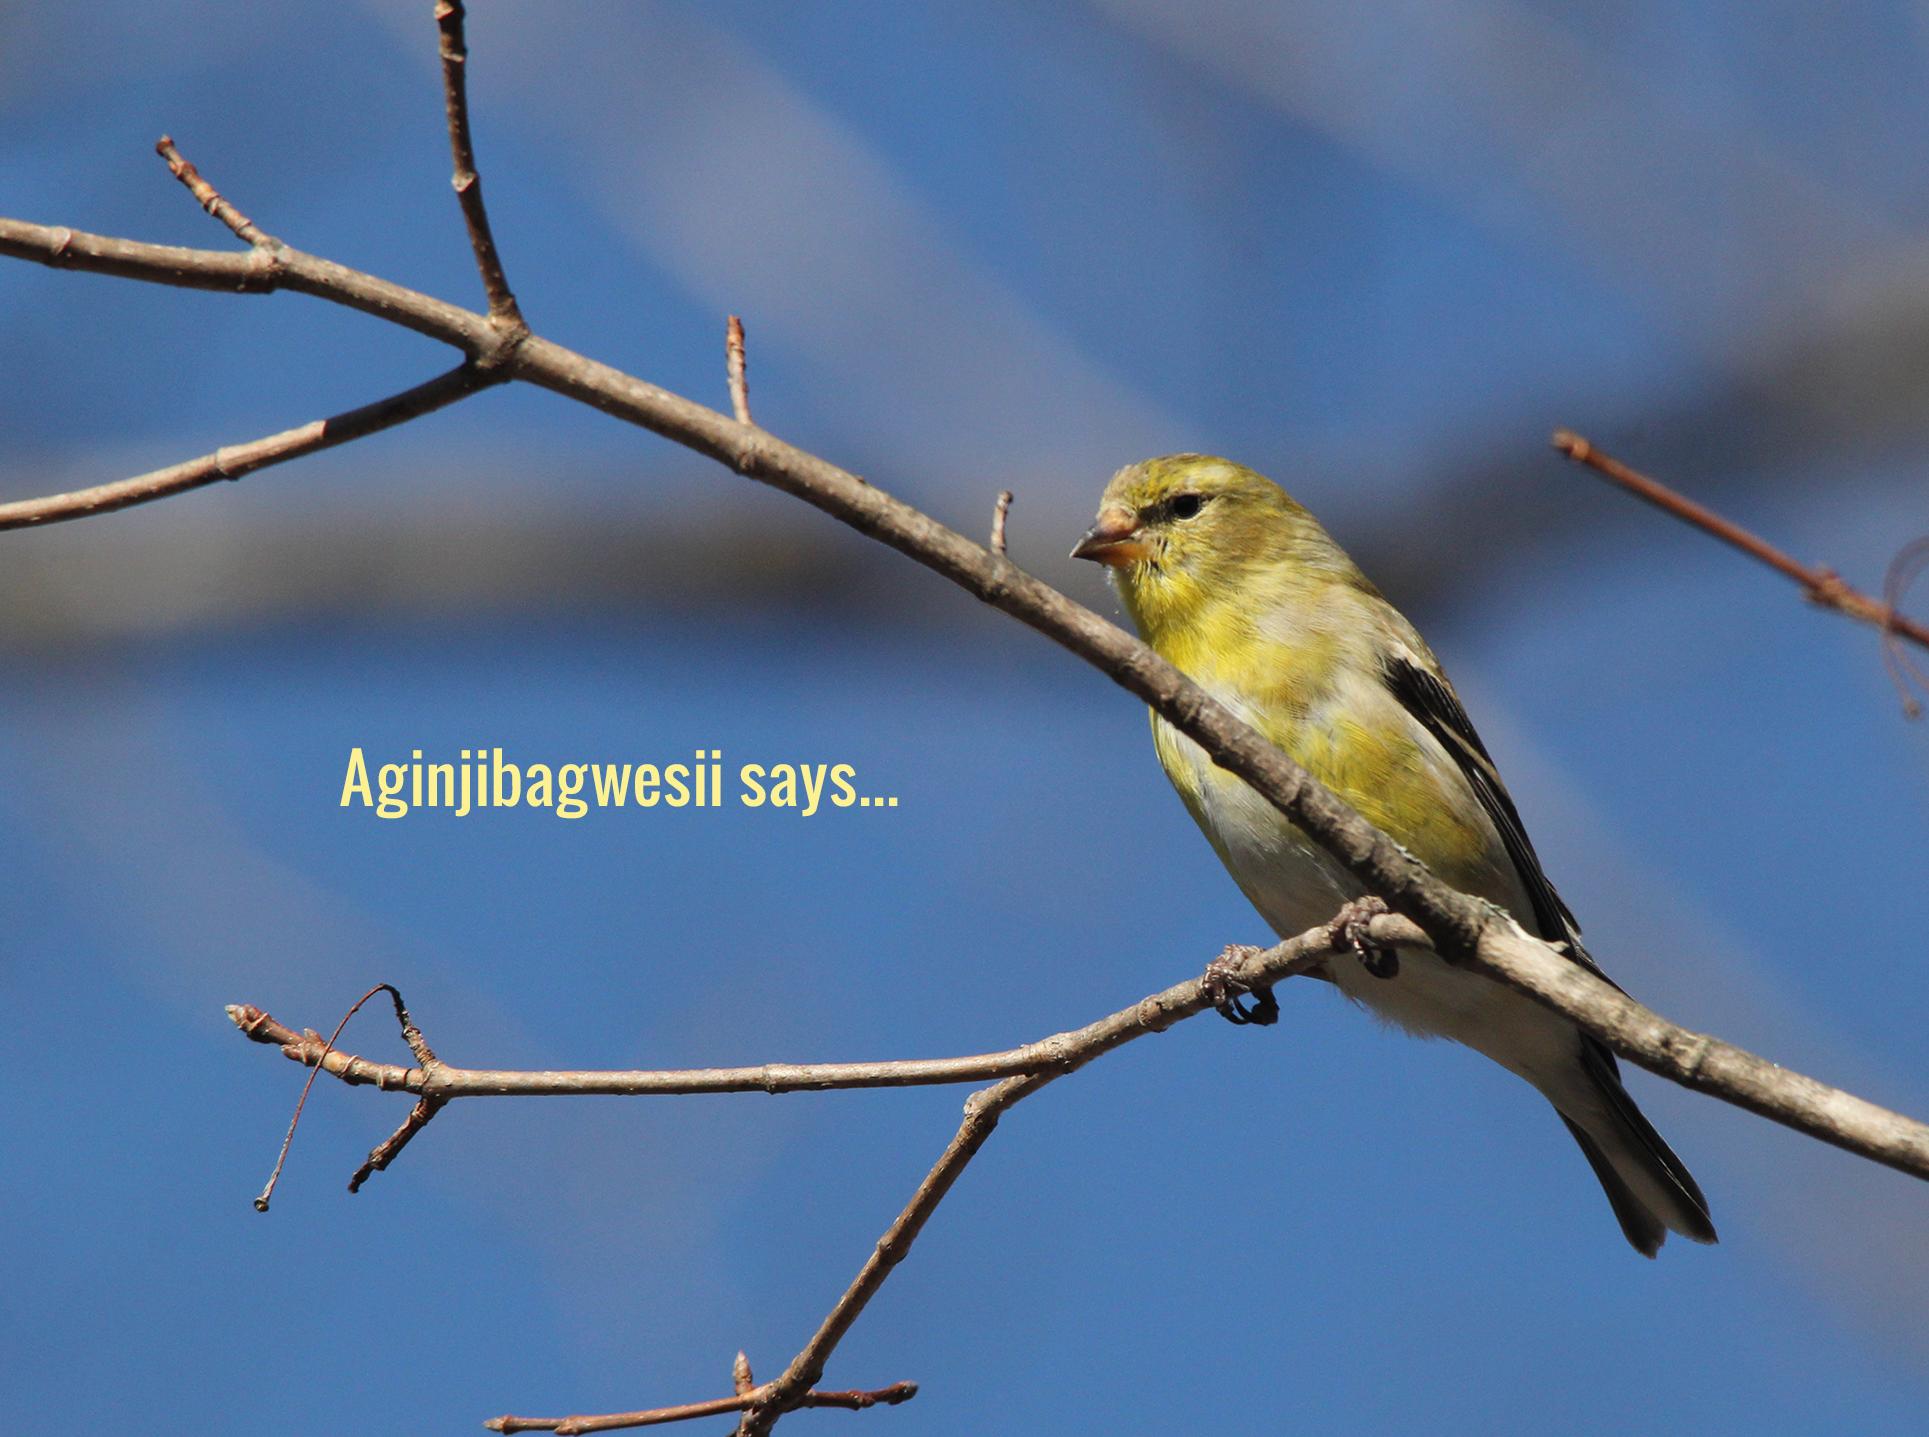 Aginjibagwesii says...